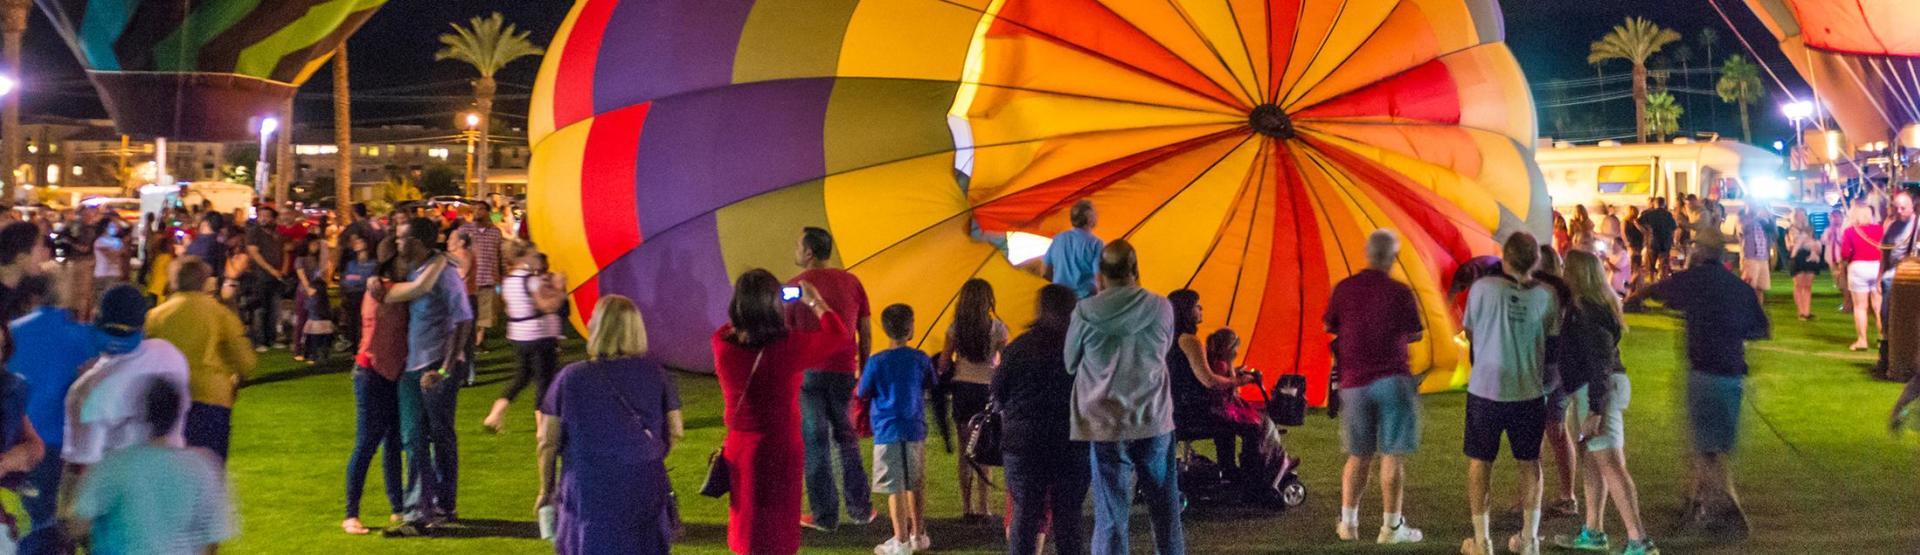 gps_cc_2200x700_hotairballoonfest__large